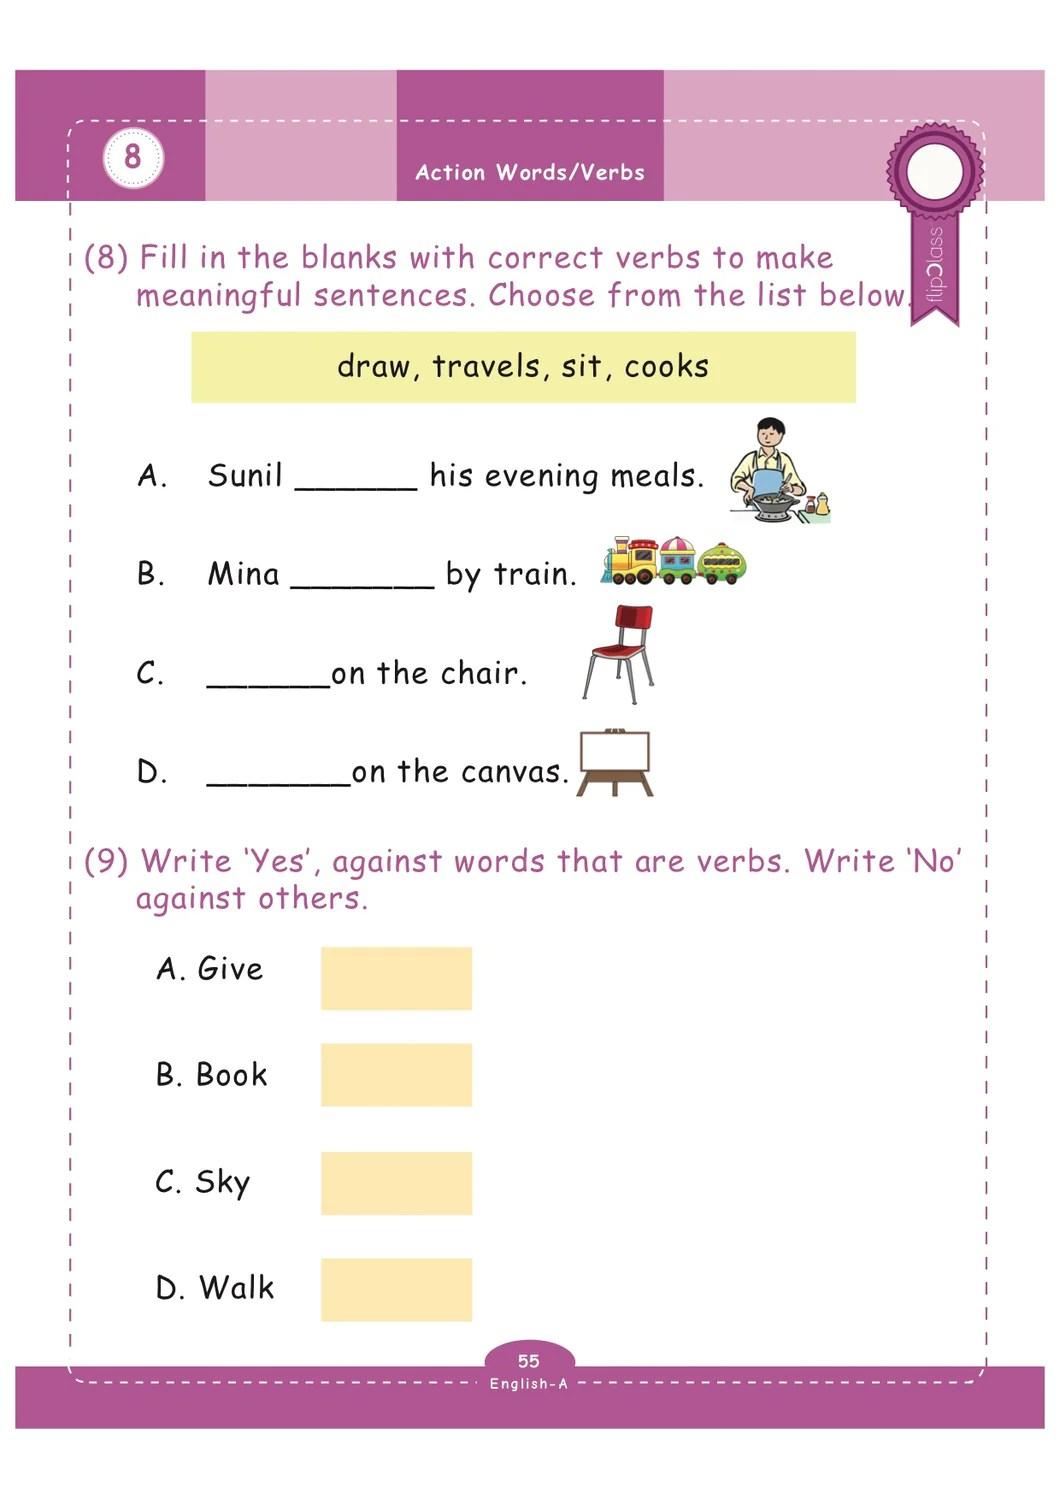 medium resolution of https://dubaikhalifas.com/english-worksheet-for-class1-grade-1-english-worksheet-kids-learning-fun/